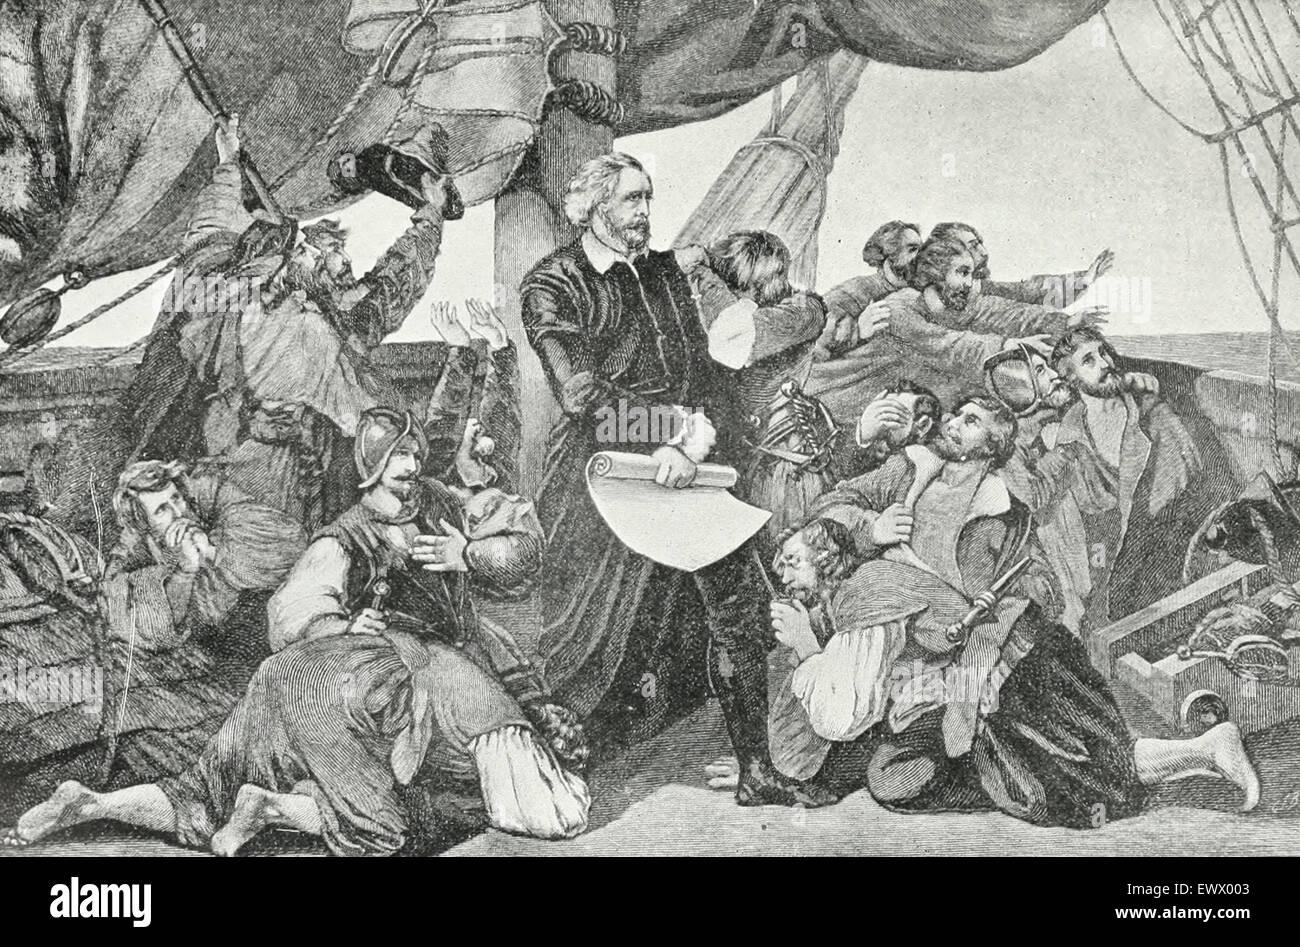 Christopher Columbus sighting land, 1492 - Stock Image